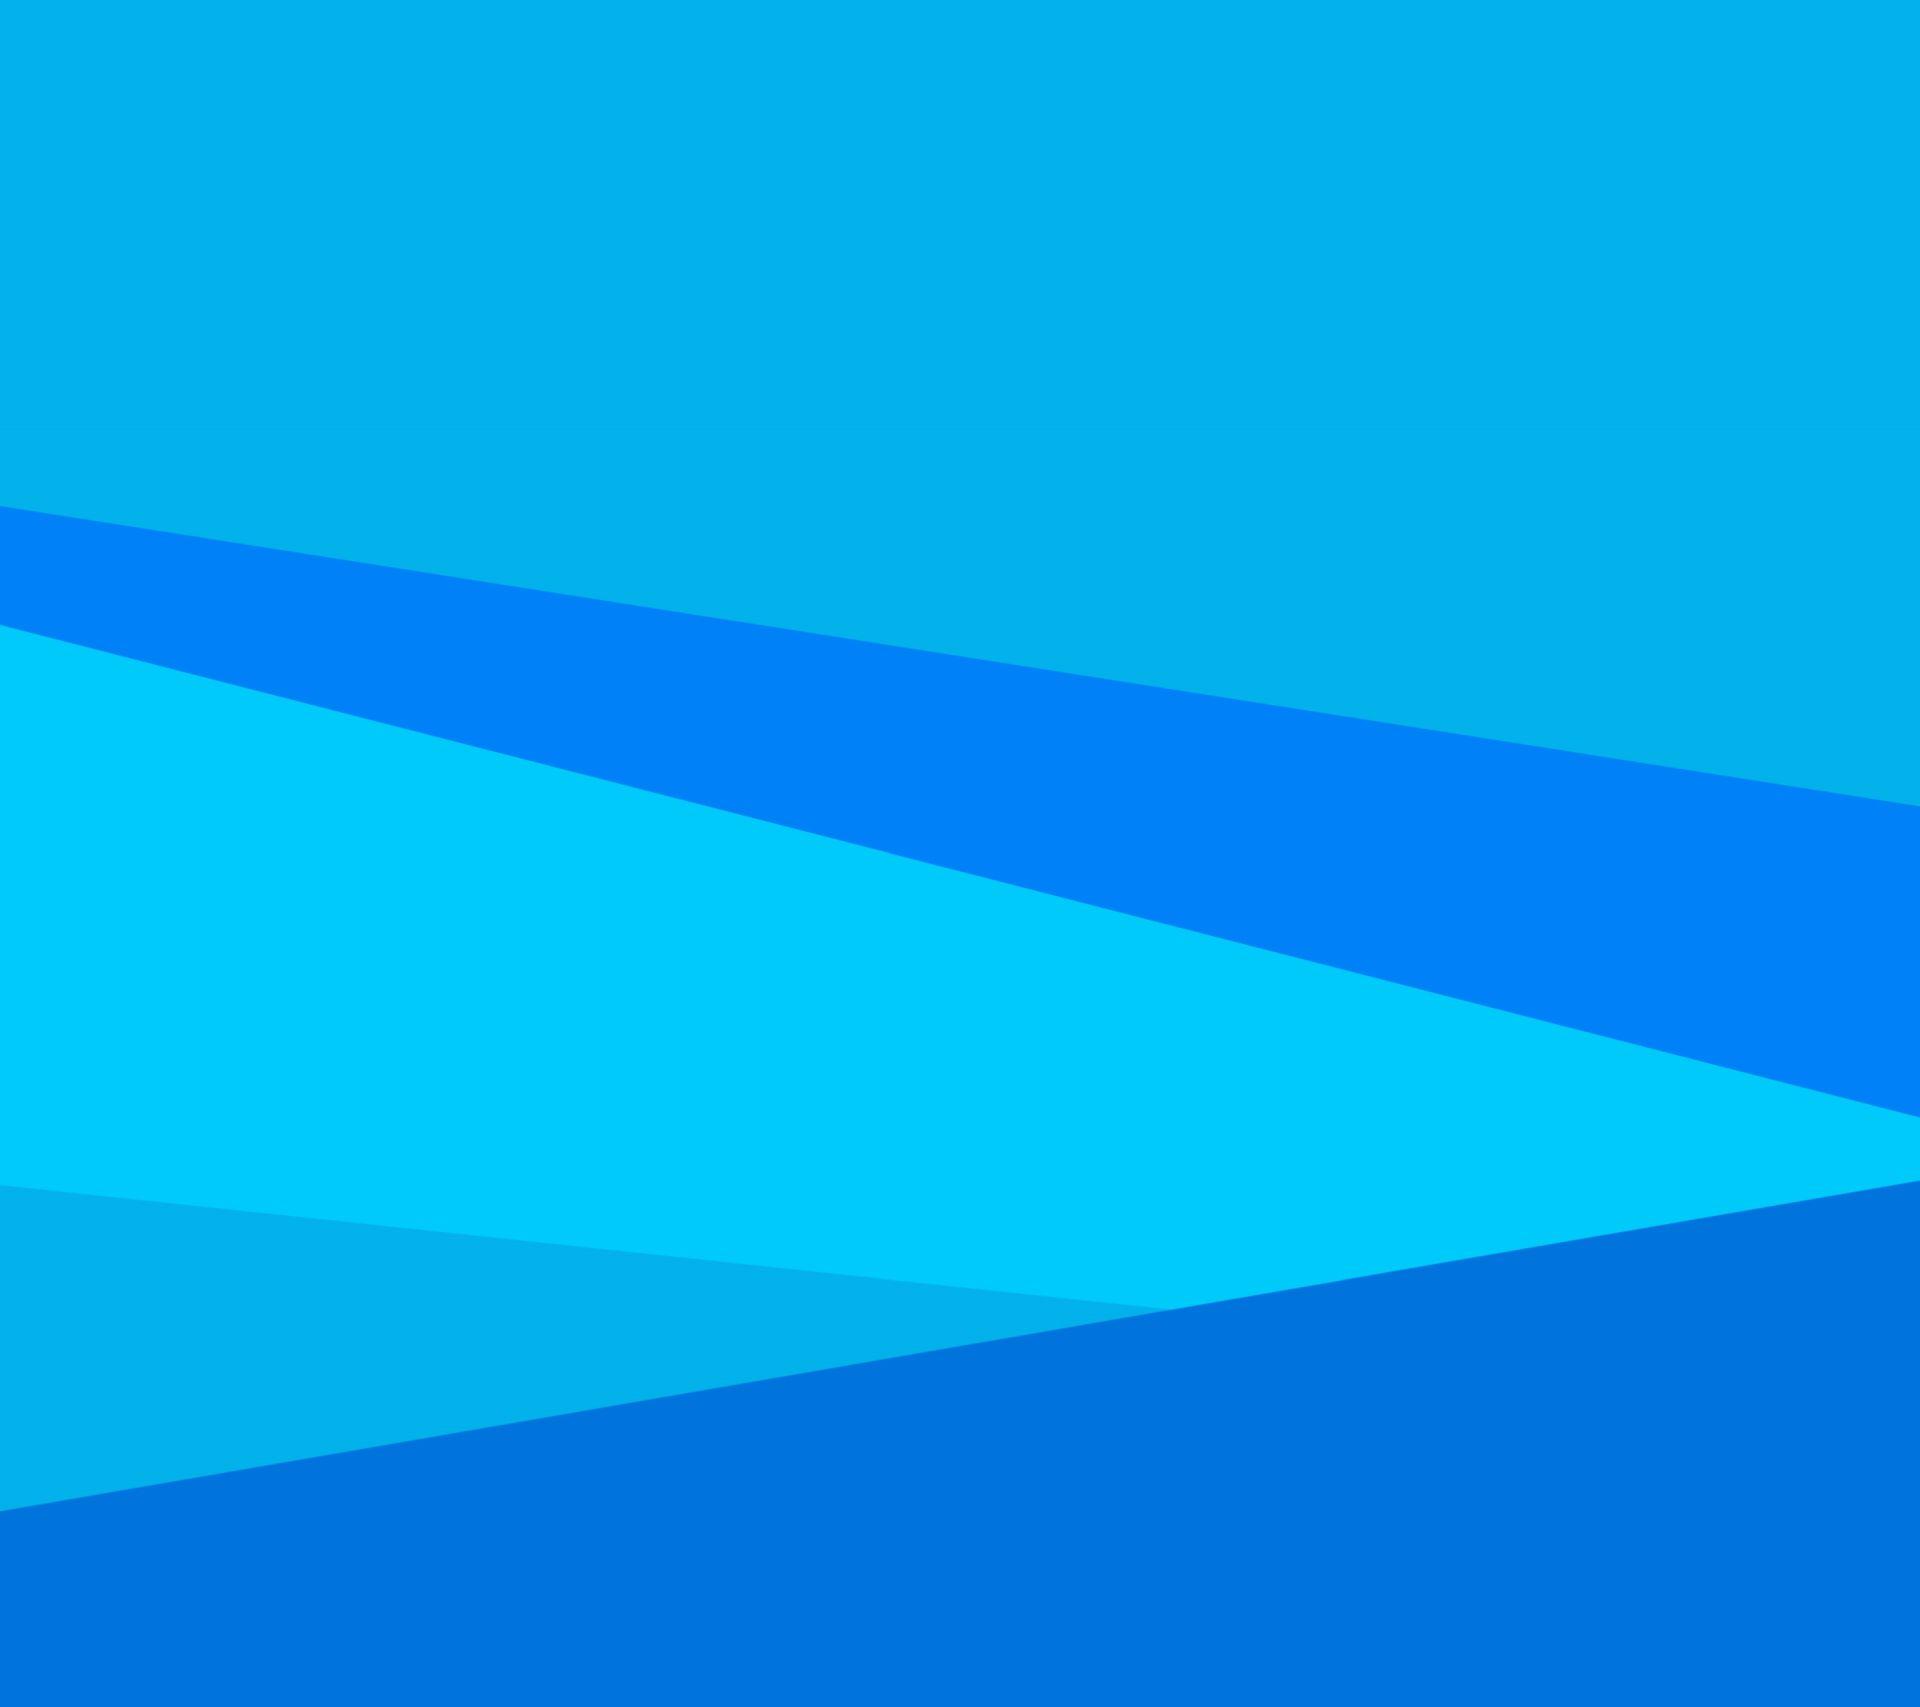 Cute Blue Background Wallpaper HD